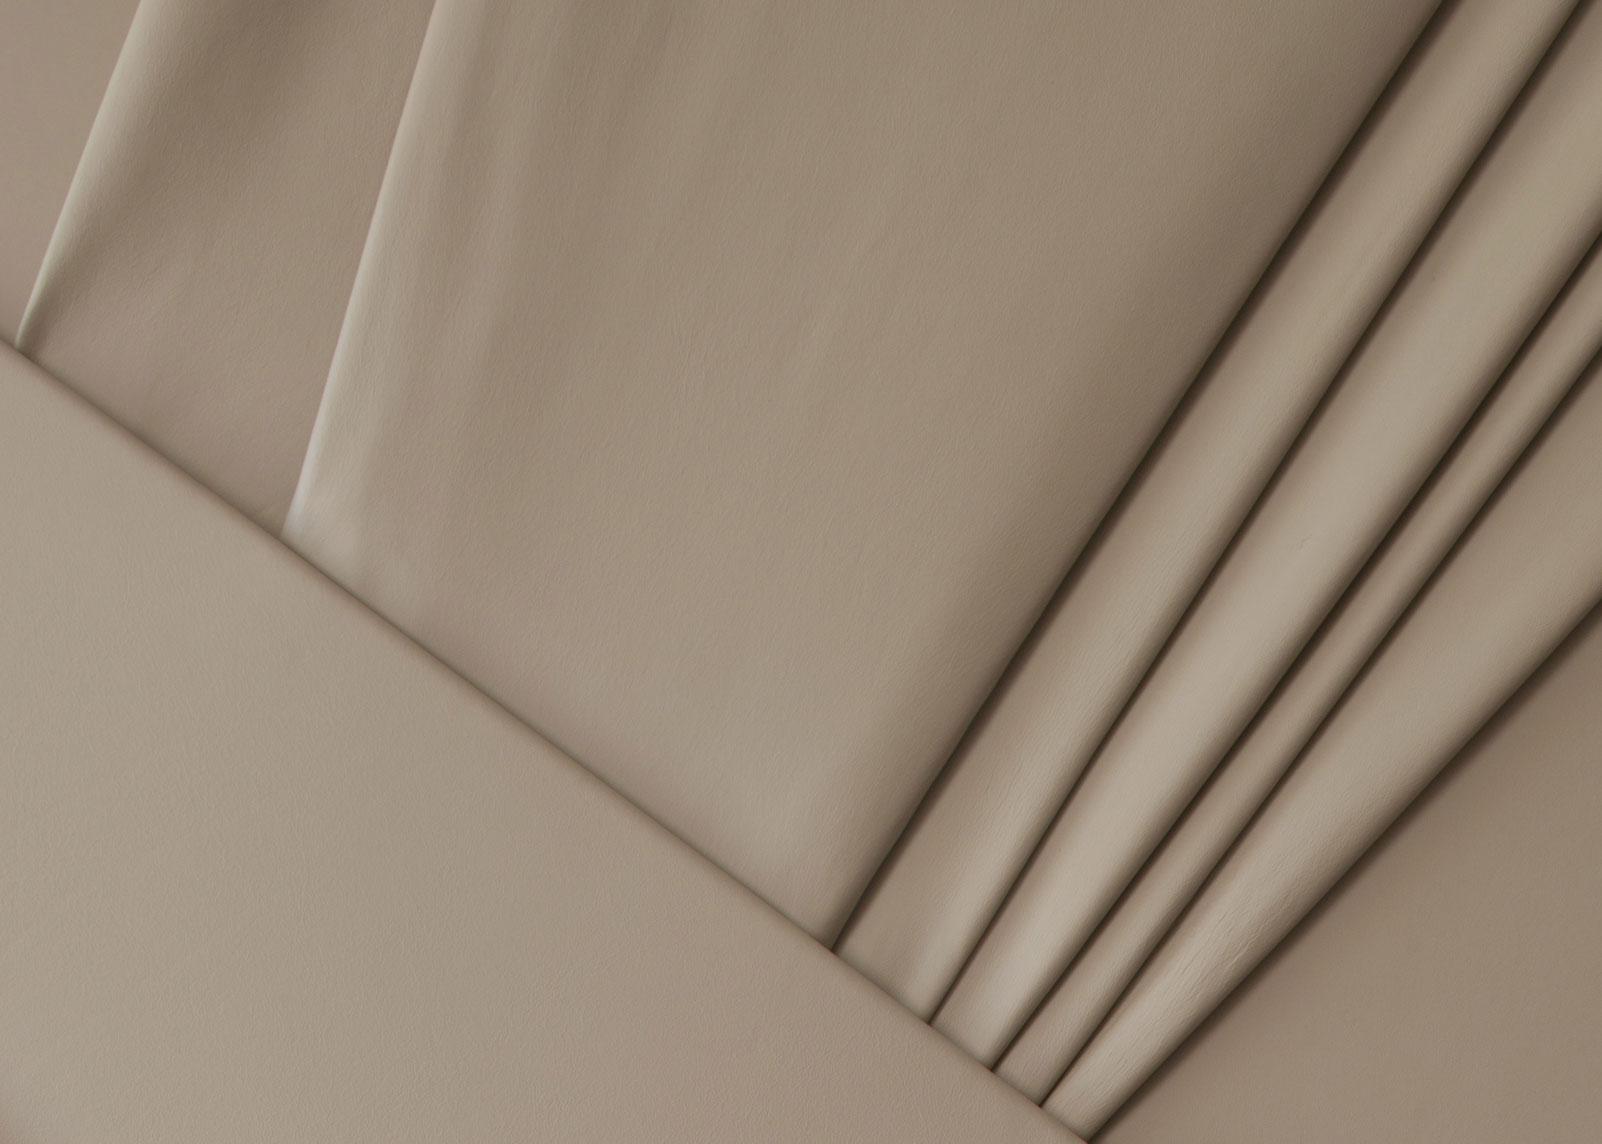 3-philippe-coudray-ad-interieurs-2017-eliott-barnes